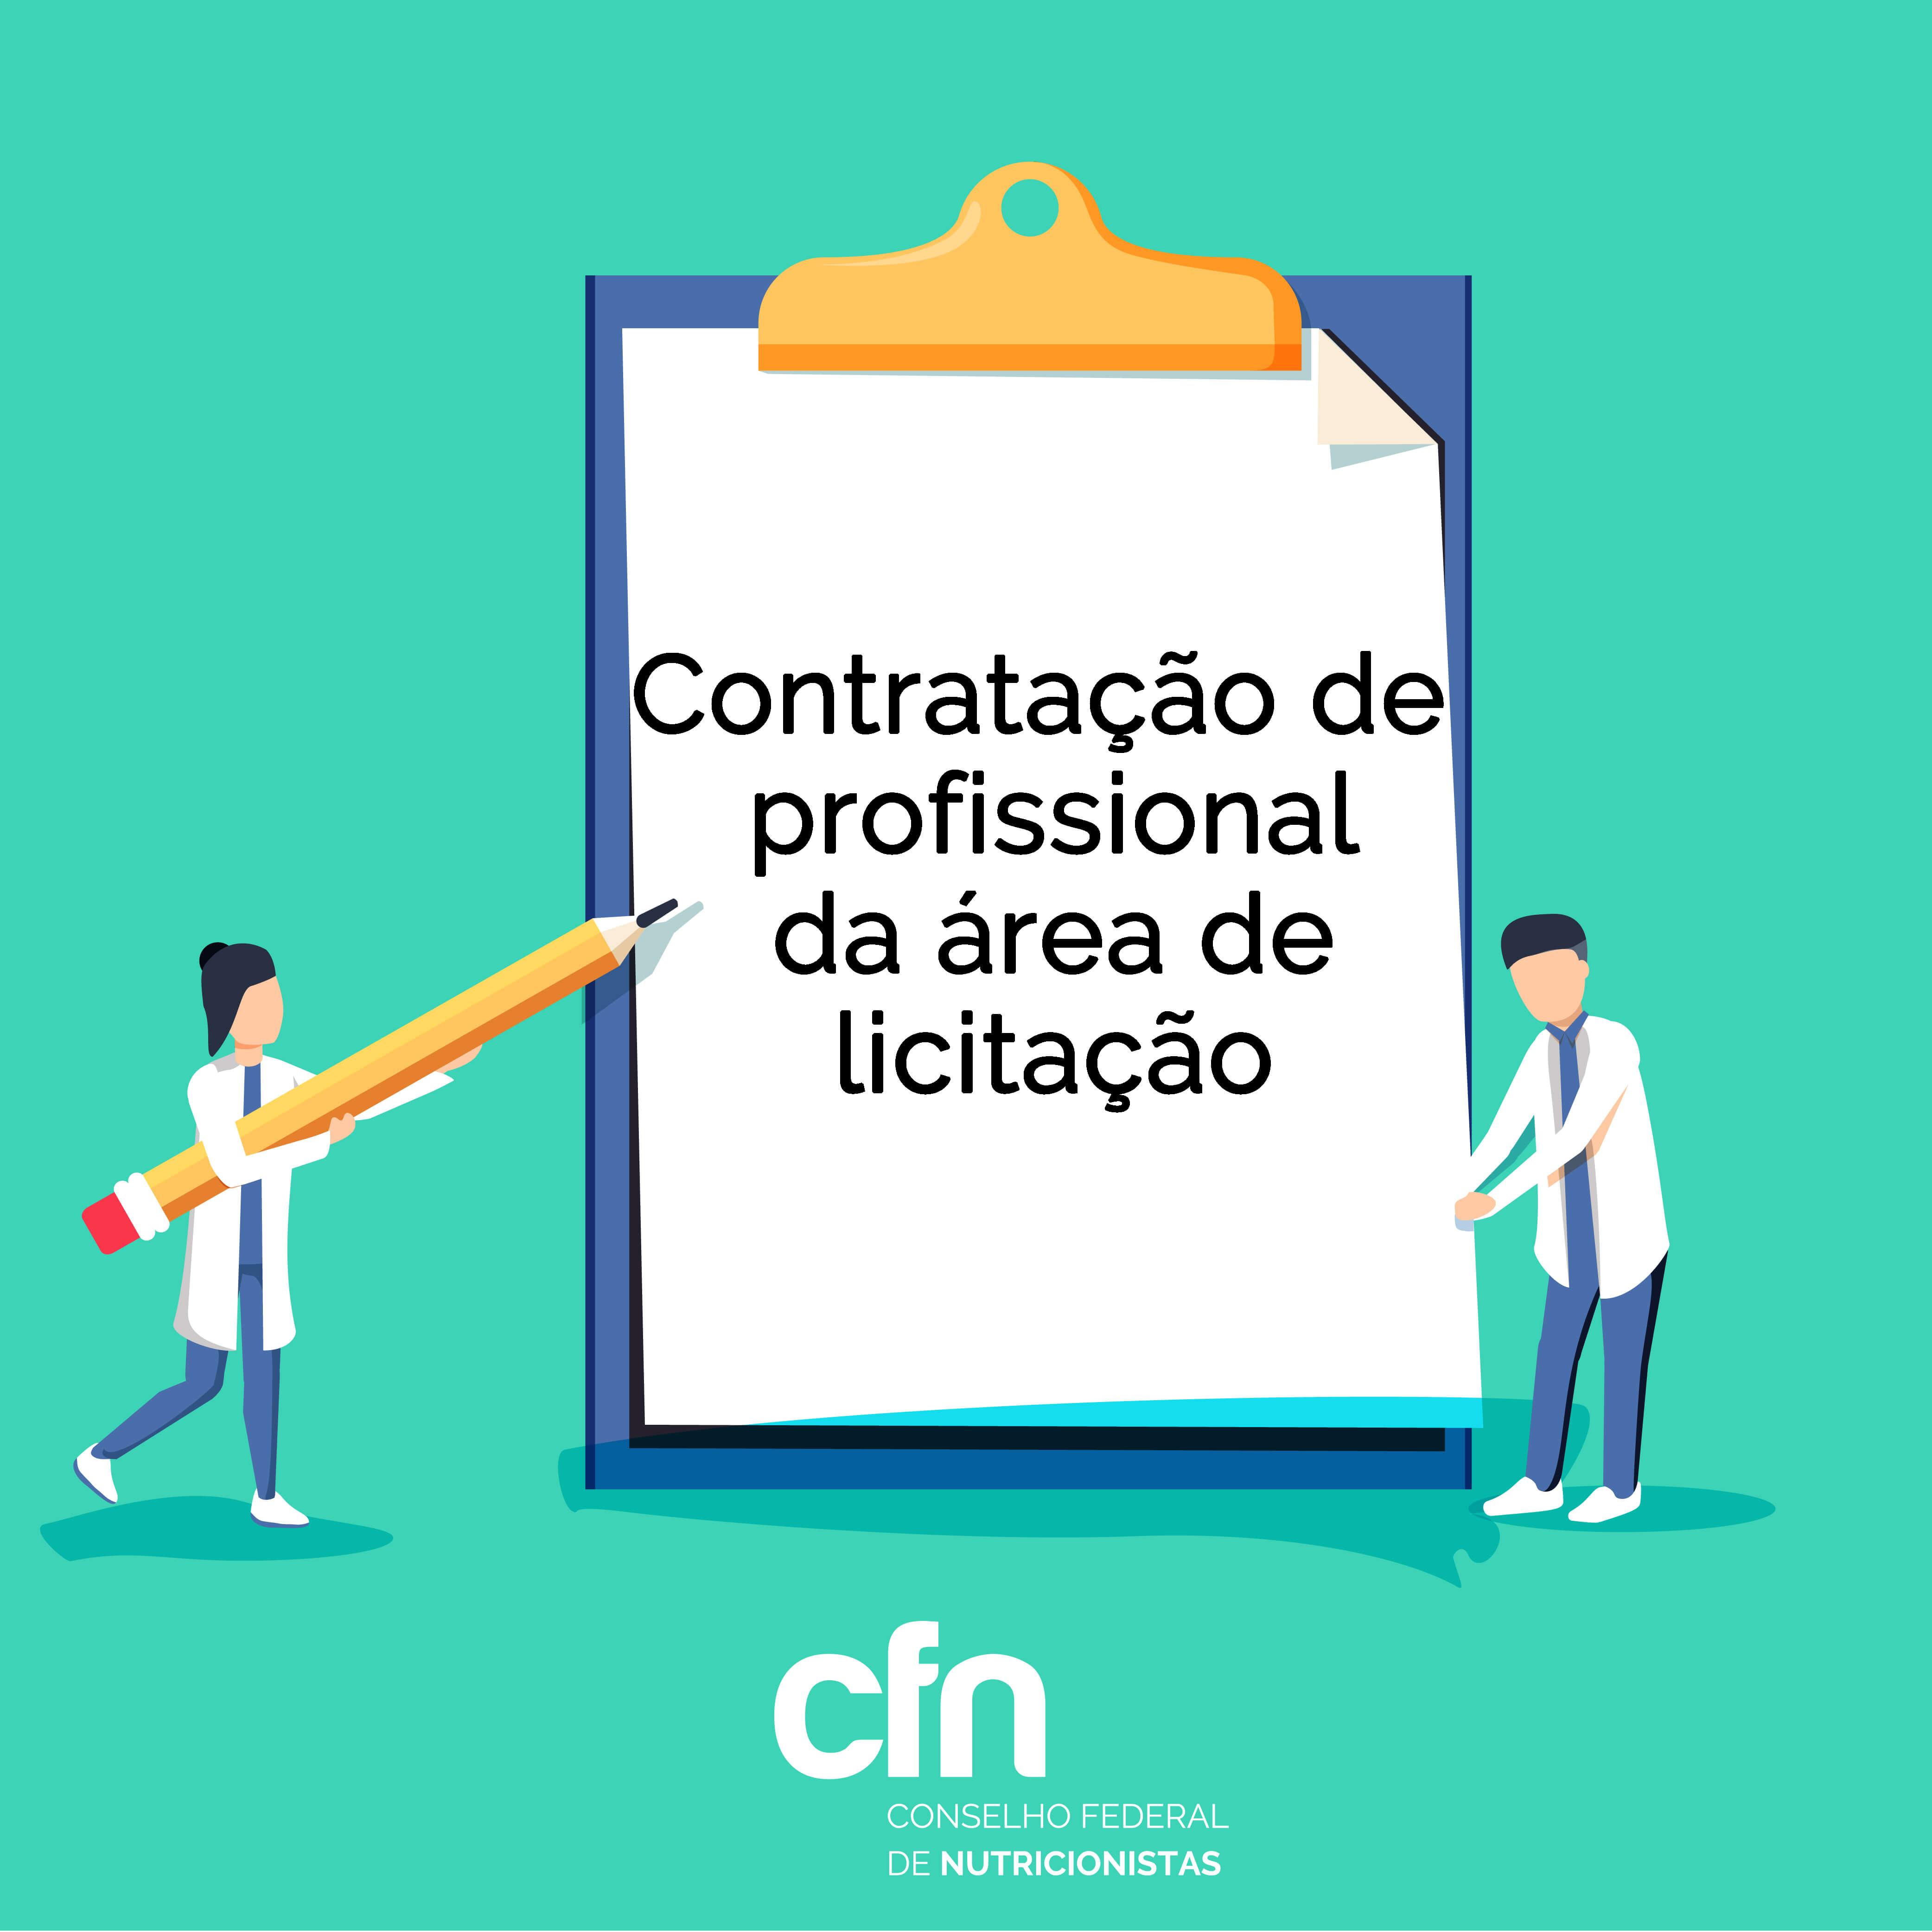 prof_area_licitacao (1)